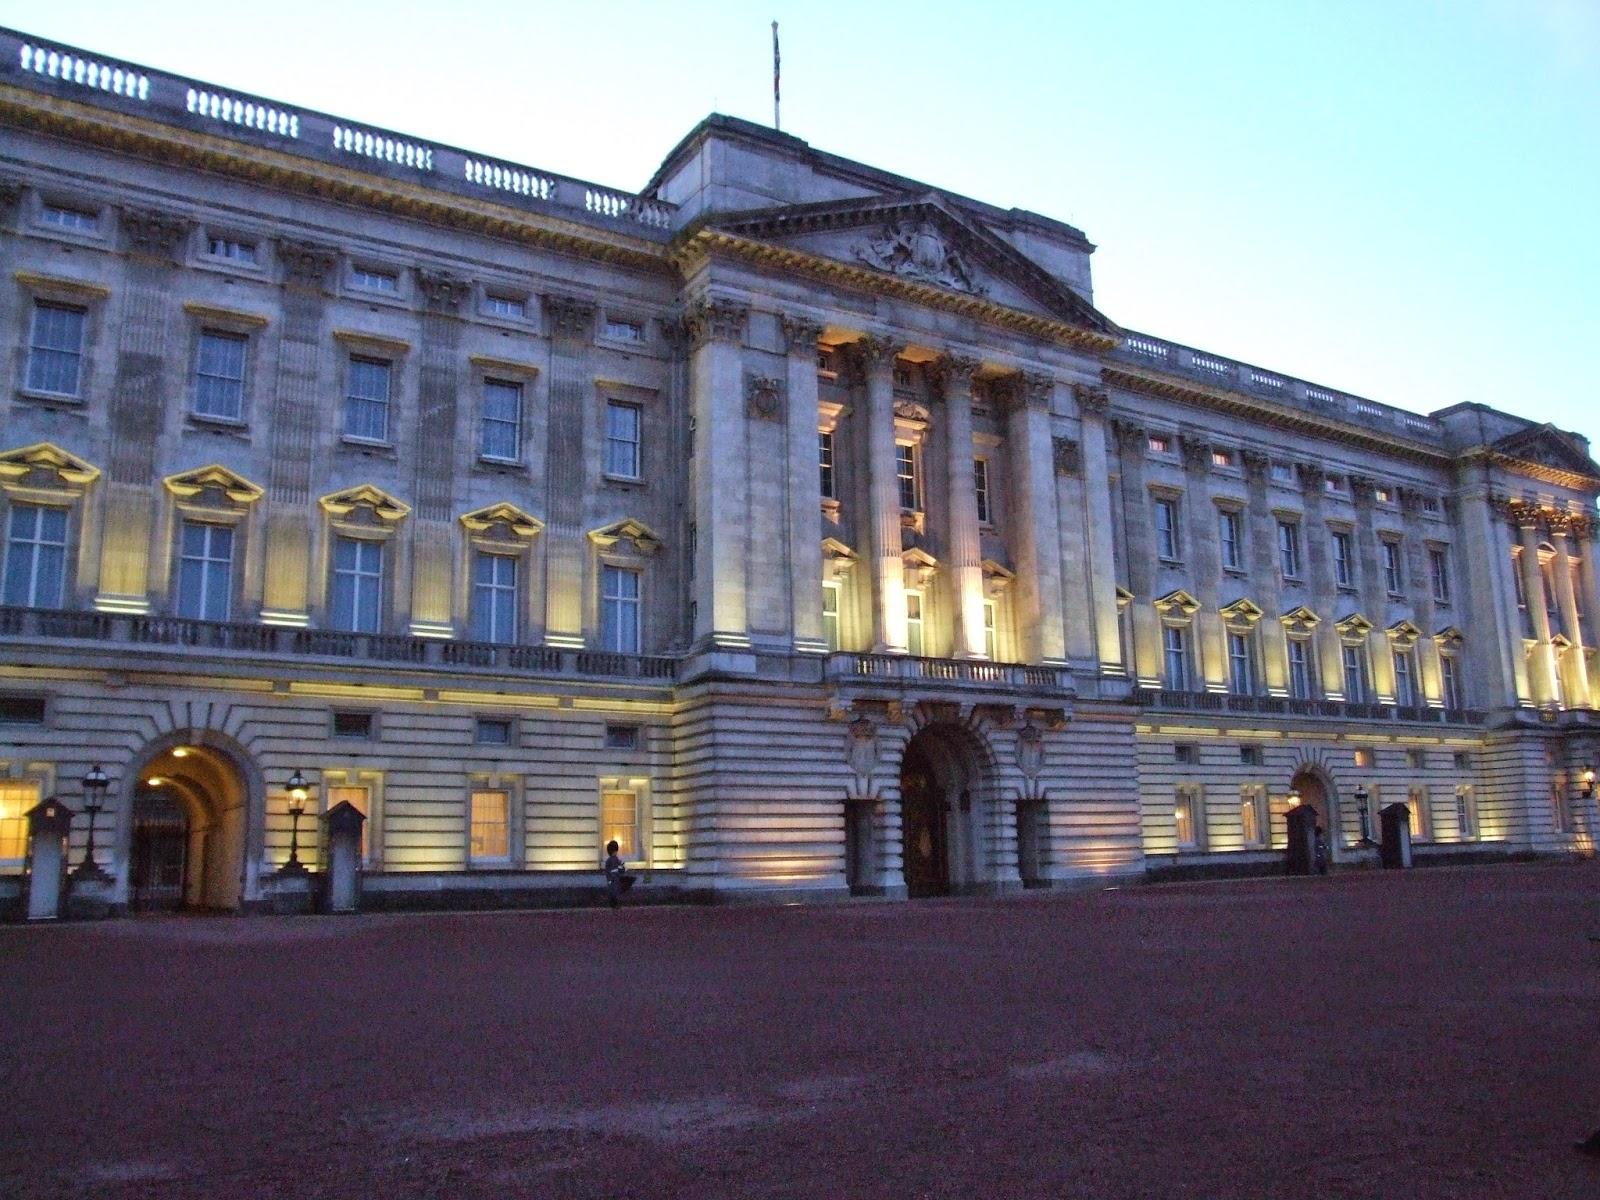 Pałac Buckingham.